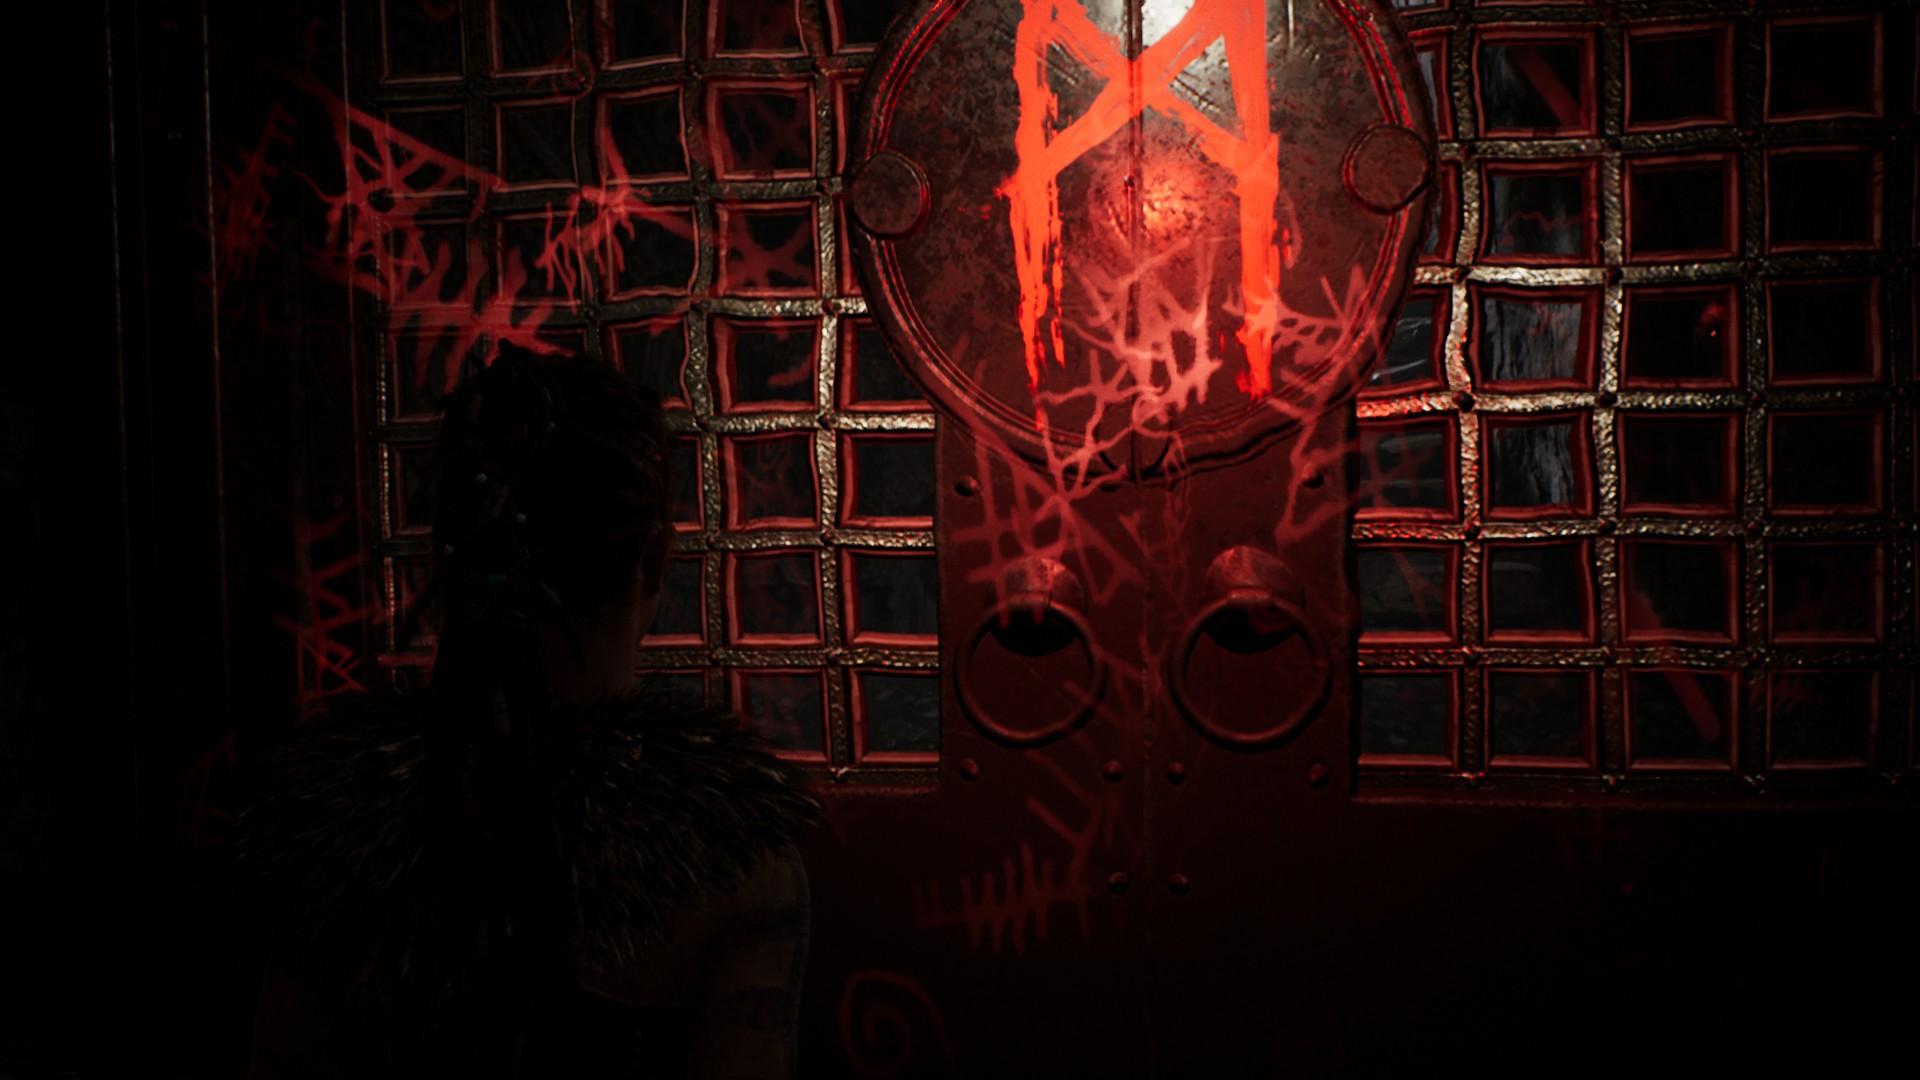 Les énigmes dans Hellblade : Senua's Sacrifice